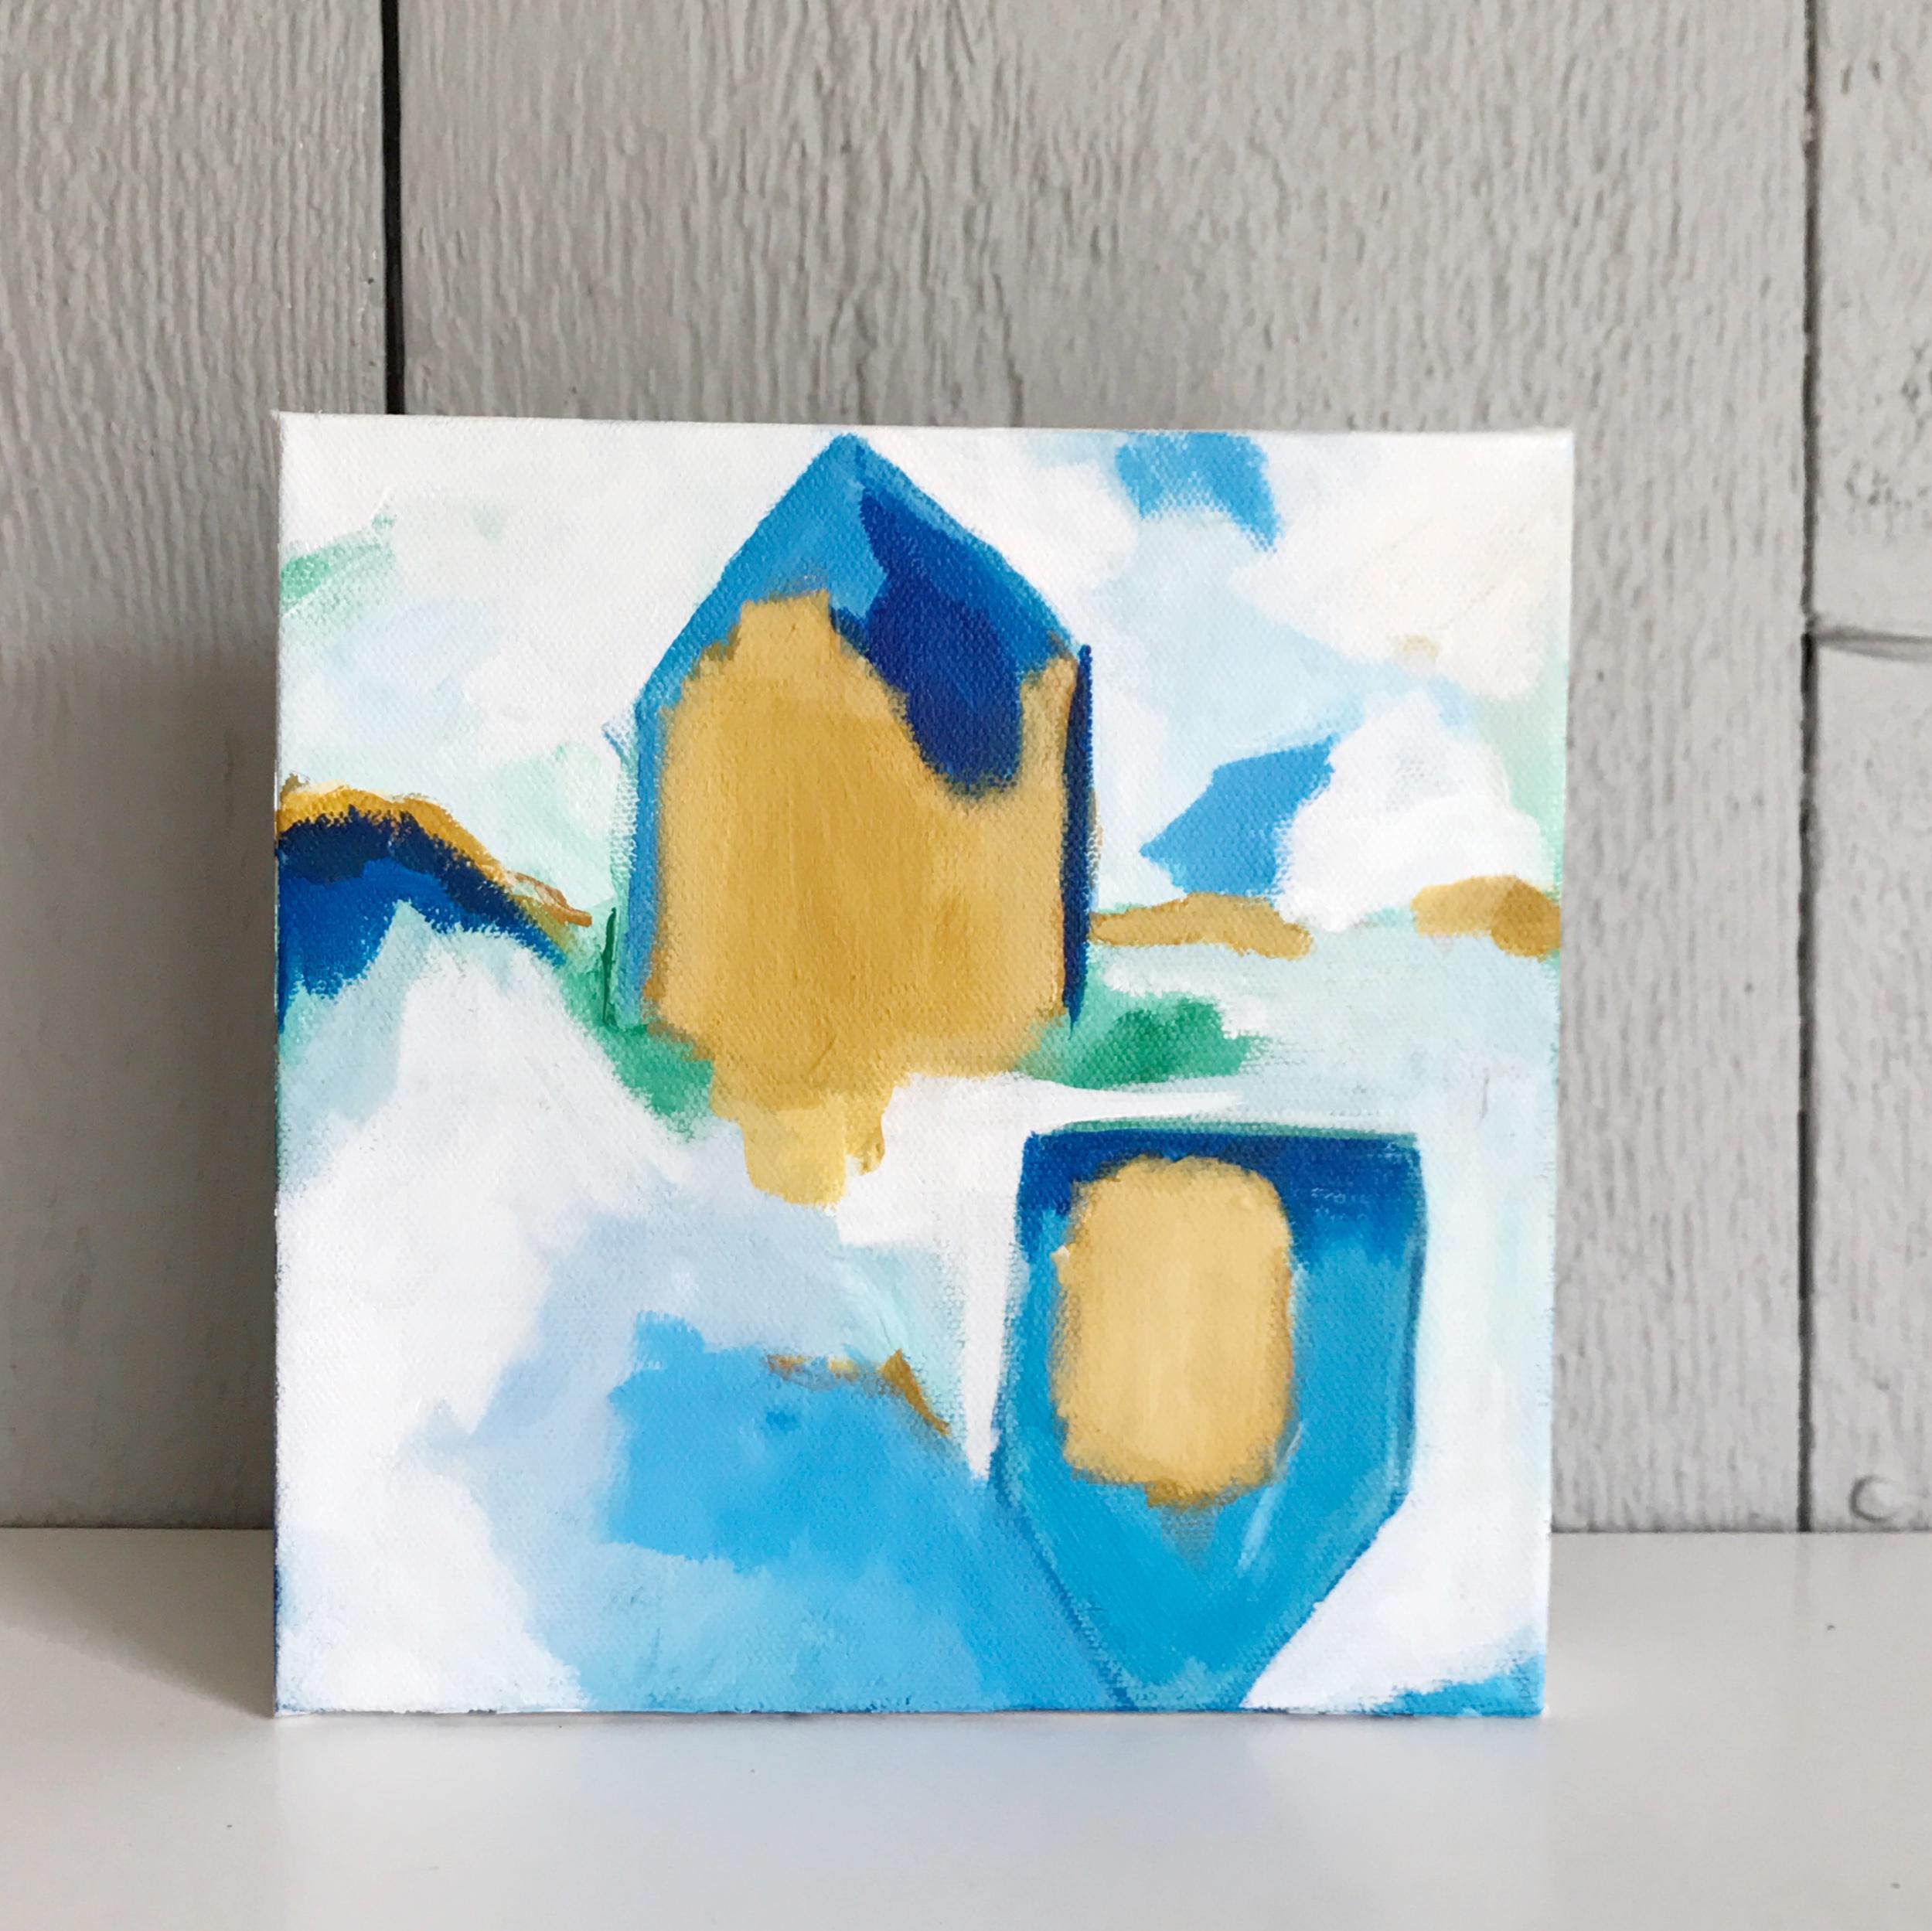 "DAY DREAM 8x8"" acrylic on canvas"